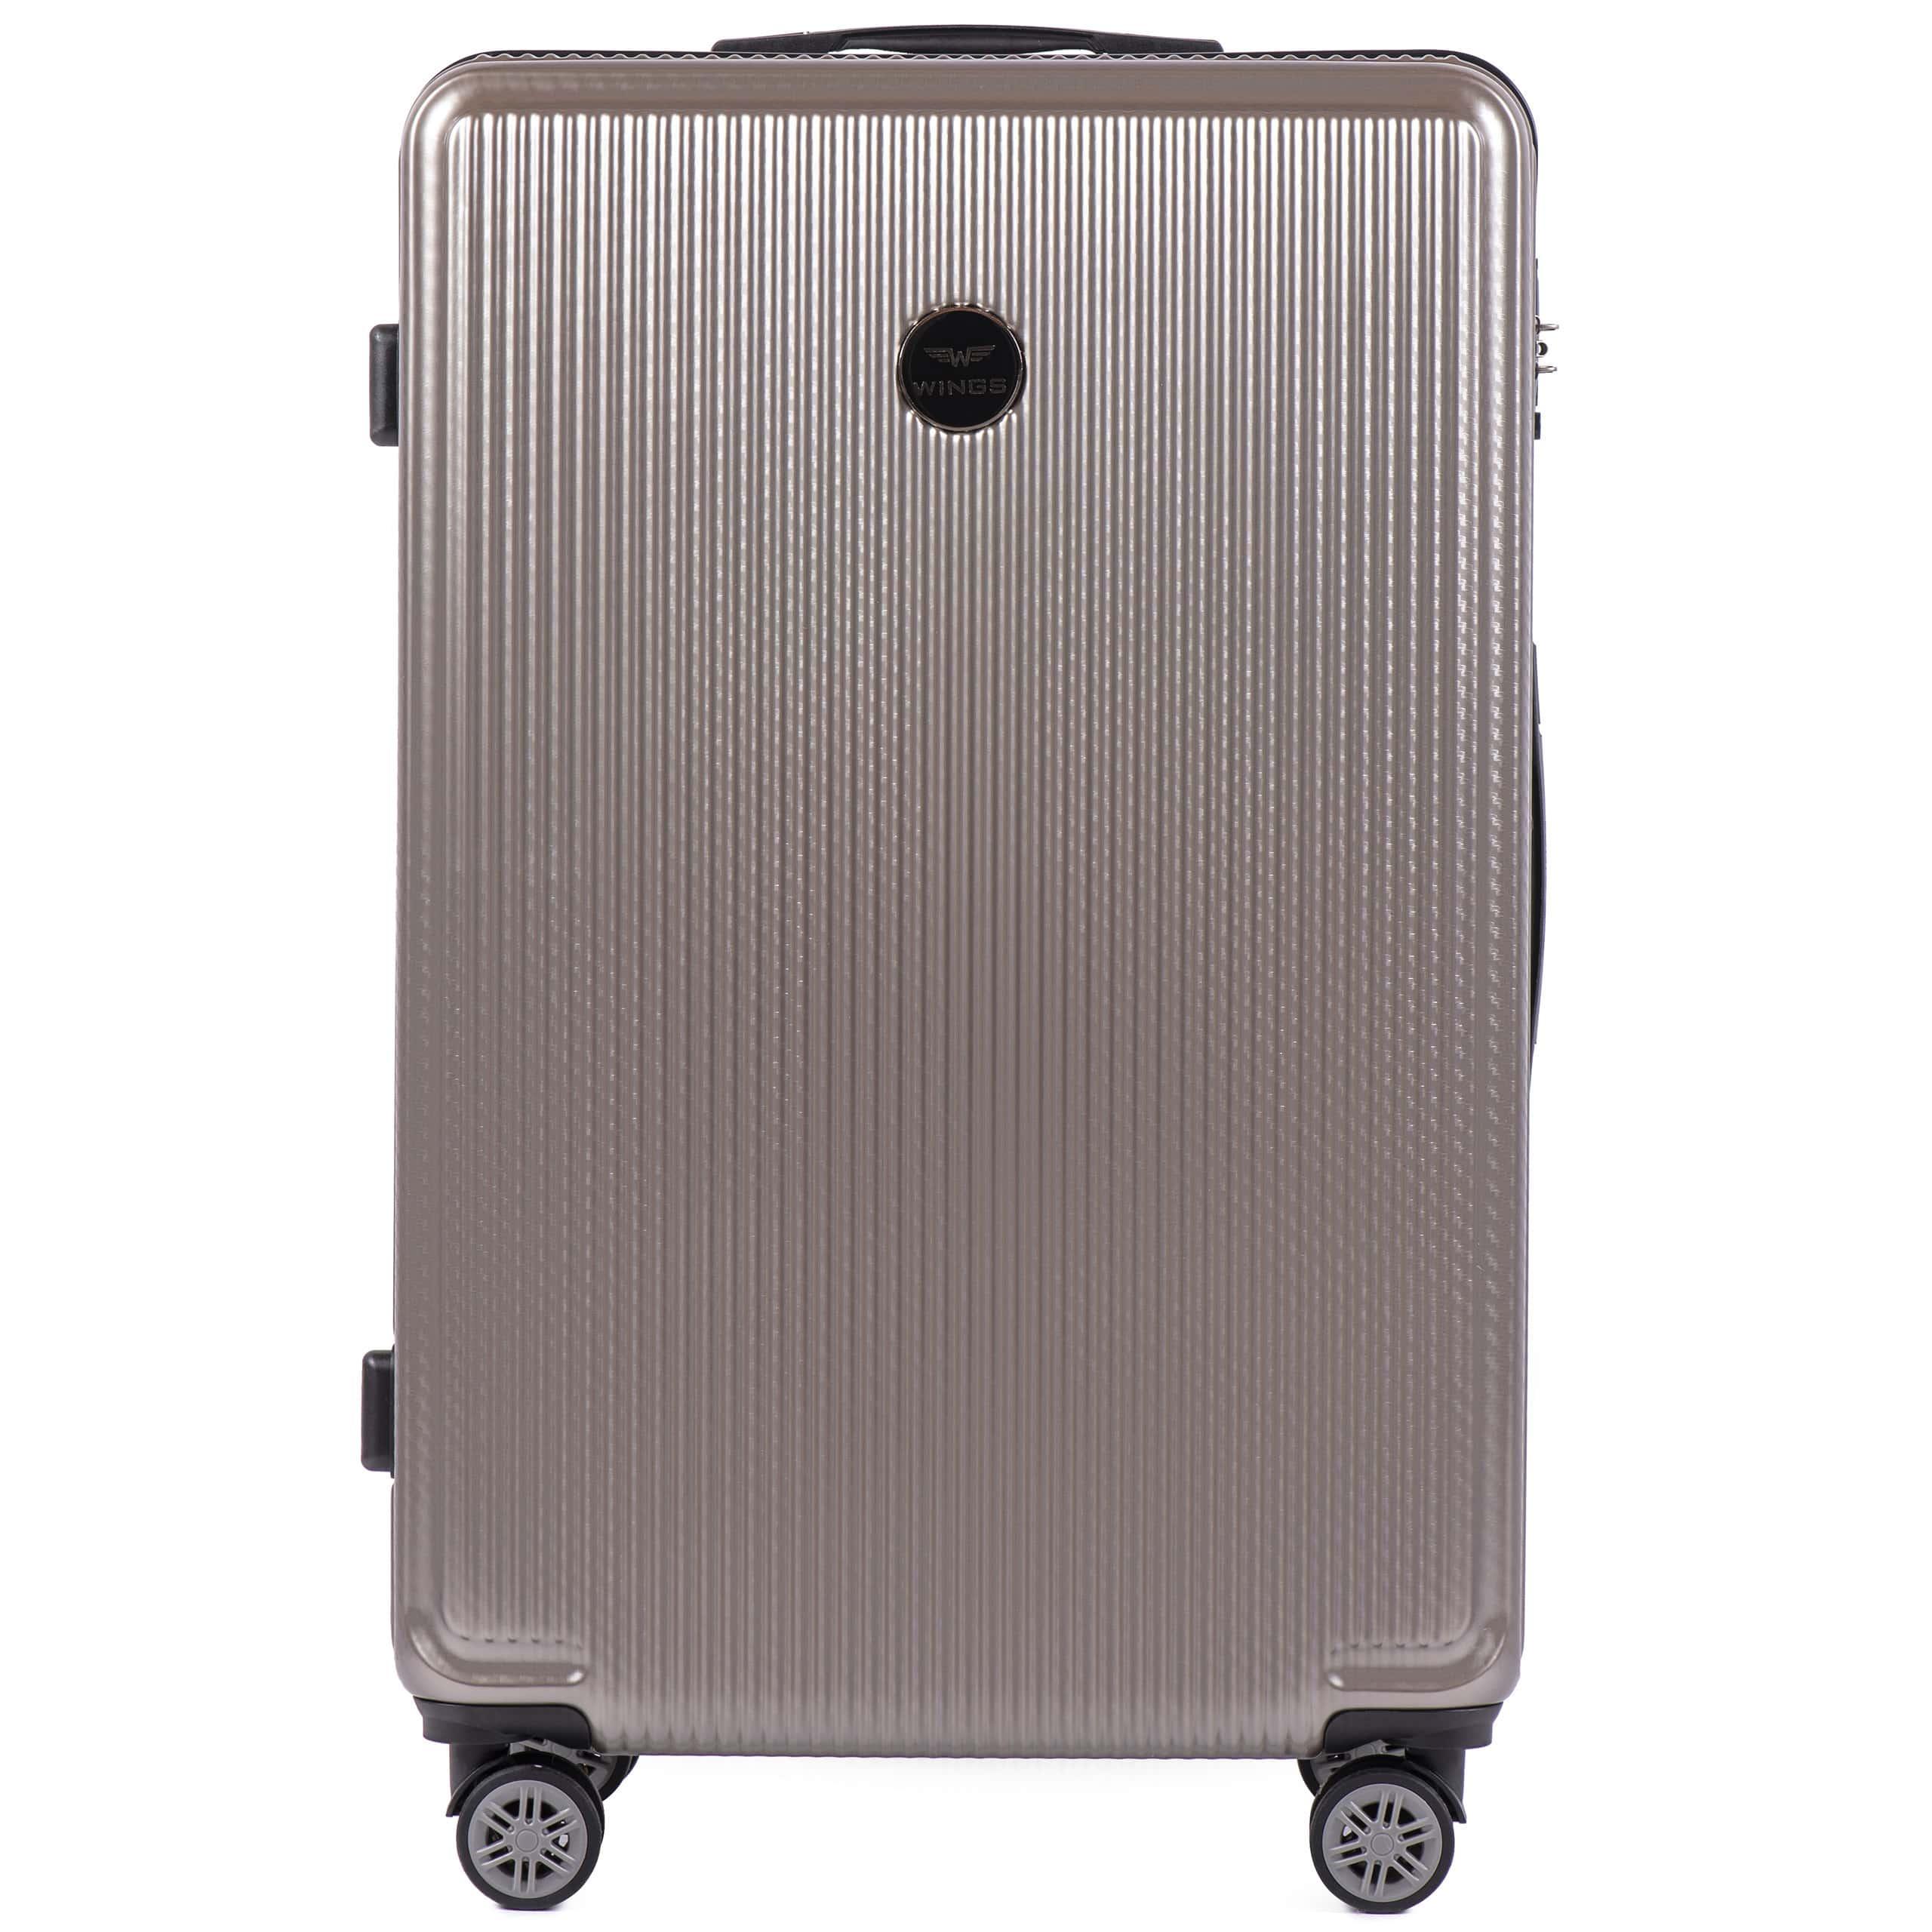 БОЛЬШОЙ ЧЕМОДАН WINGS PREMIUM 565 L BRONZE. Для багажа ,до 23 кг